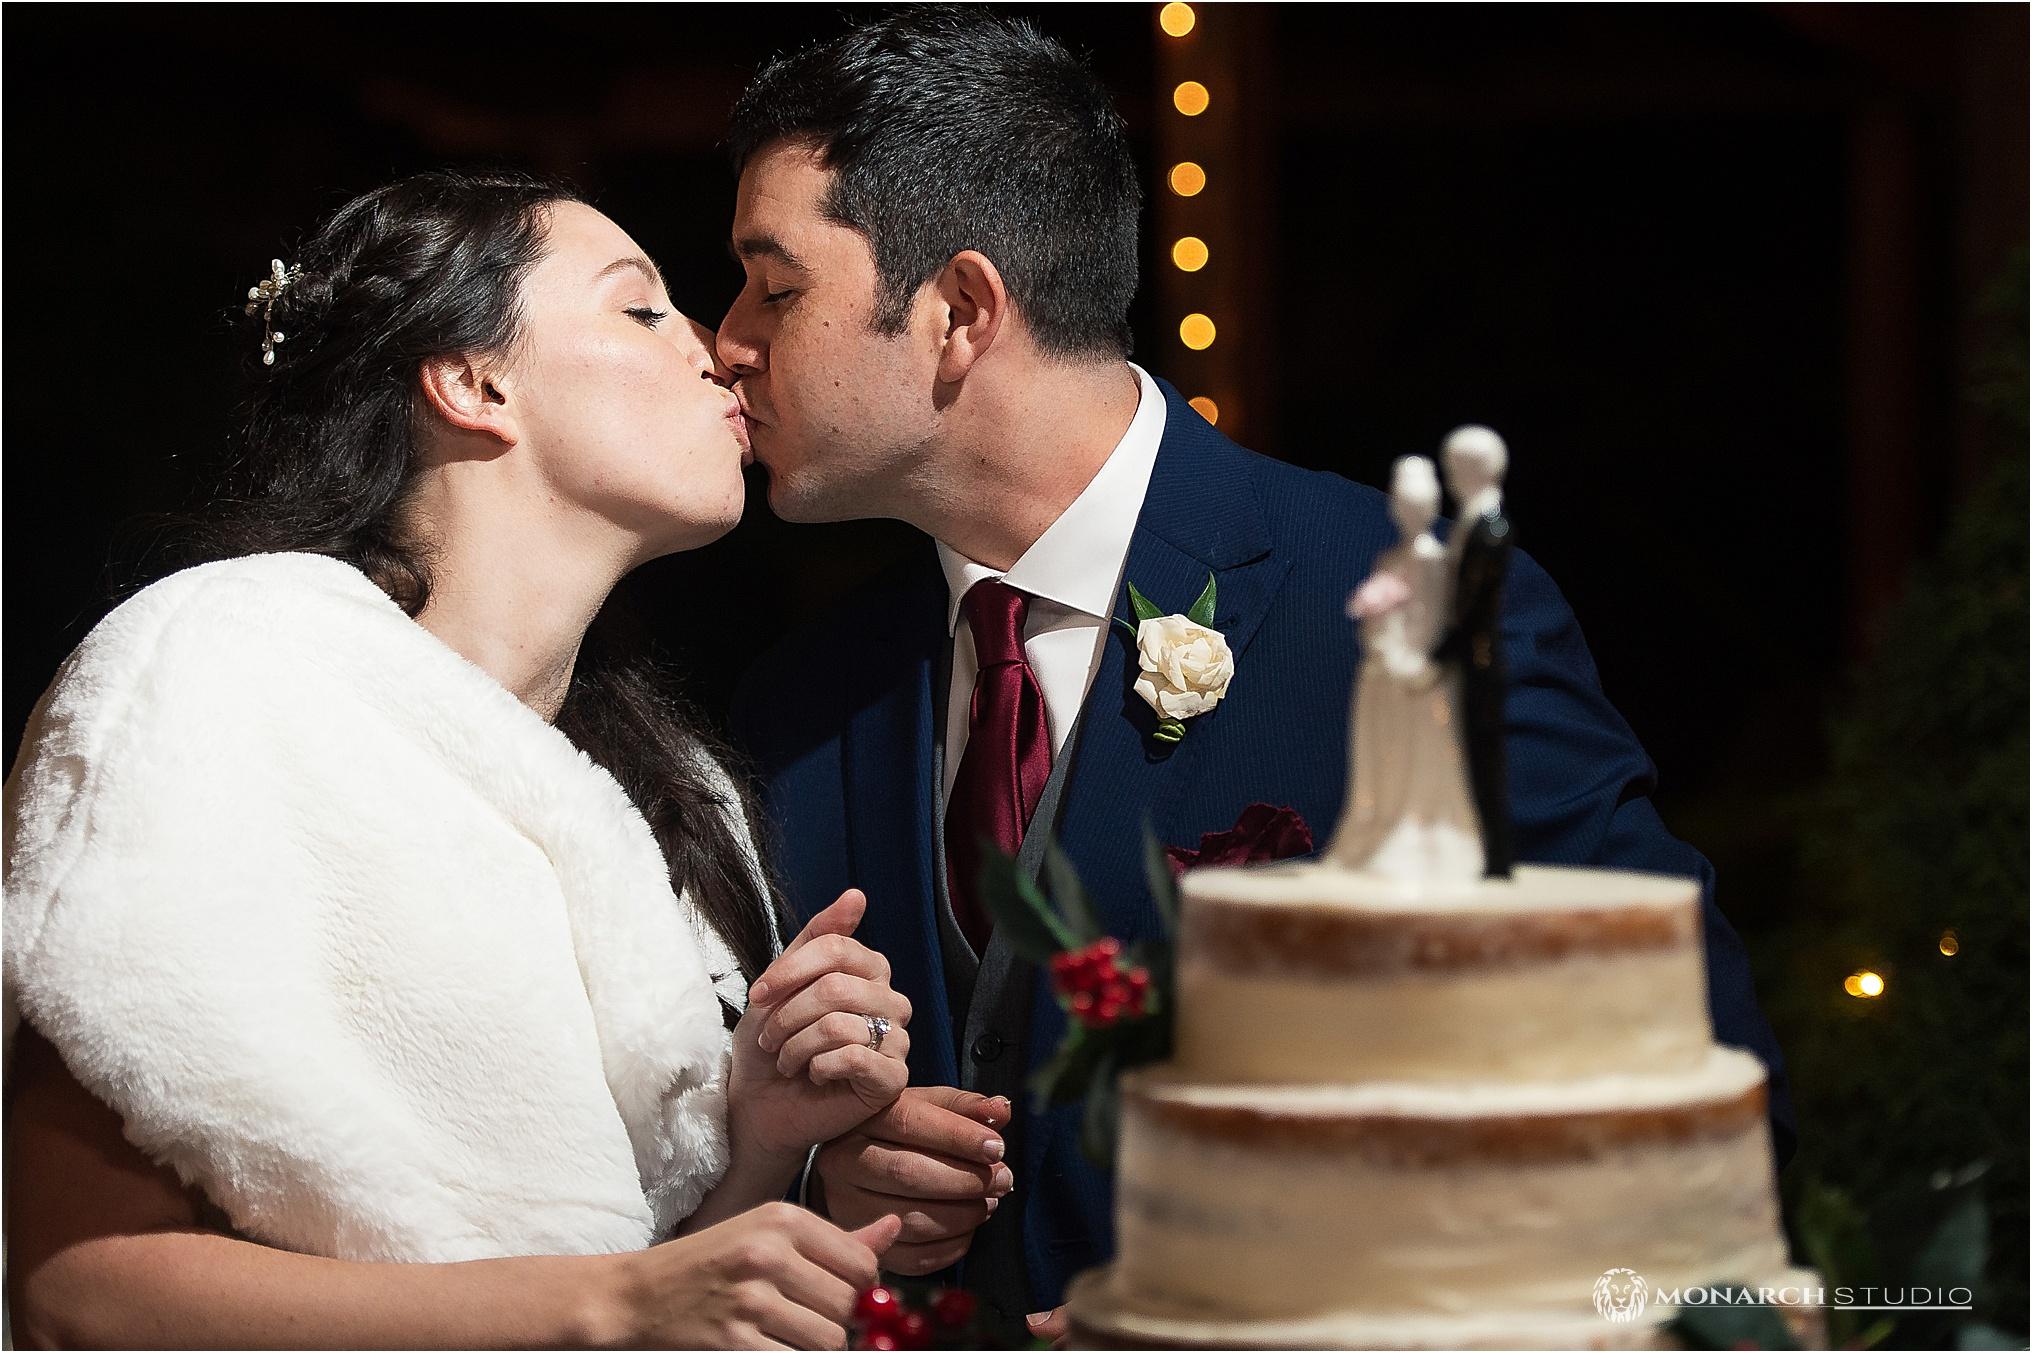 Wedding-photographer-in-sanford-florida-natural-wedding-104.jpg